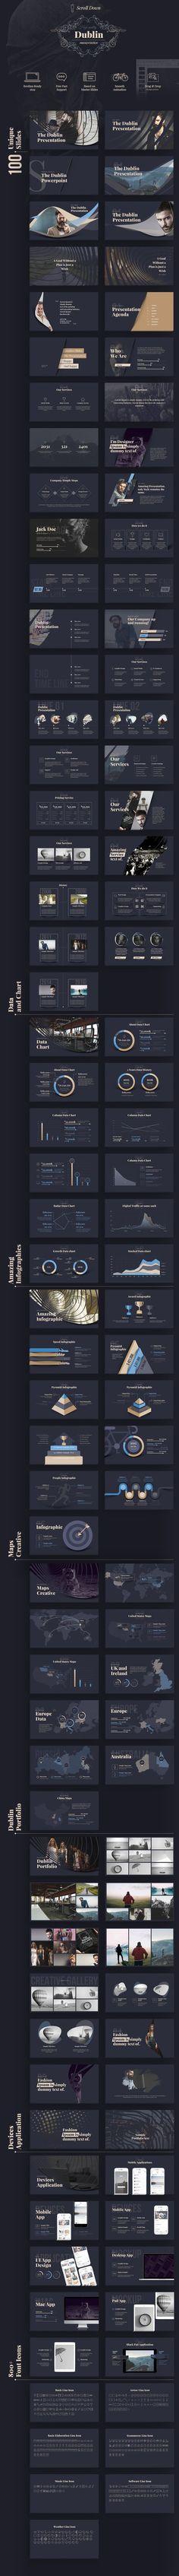 Elegant dark PowerPoint slide presentation template in navy and gold. Very luxurious!